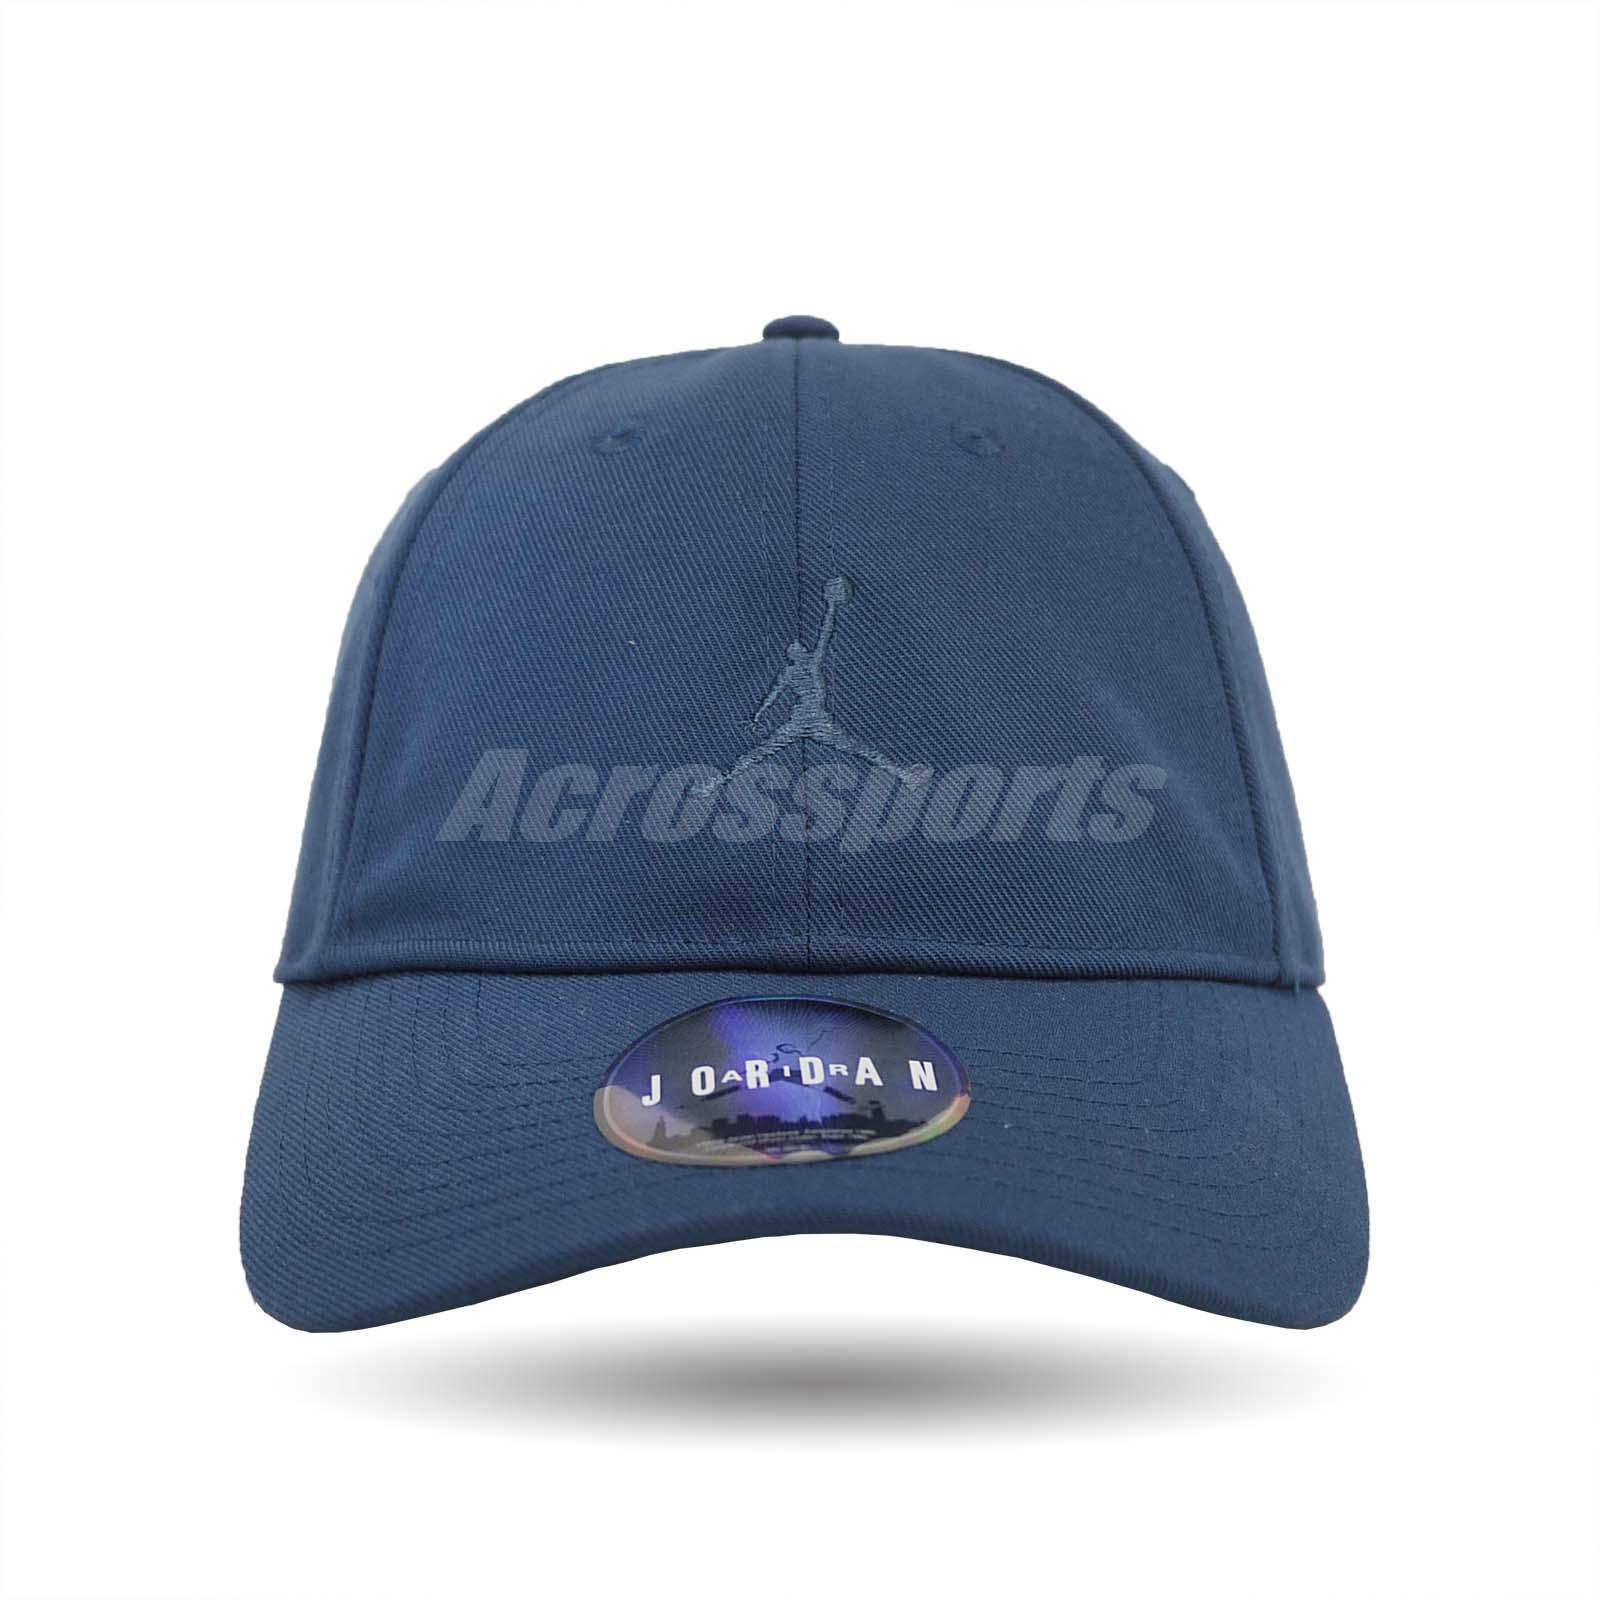 5aa81315de597f ... netherlands nike jordan jumpman floppy h86 adjustable hat heritage gym  cap blue 847143 414 e36e9 b9627